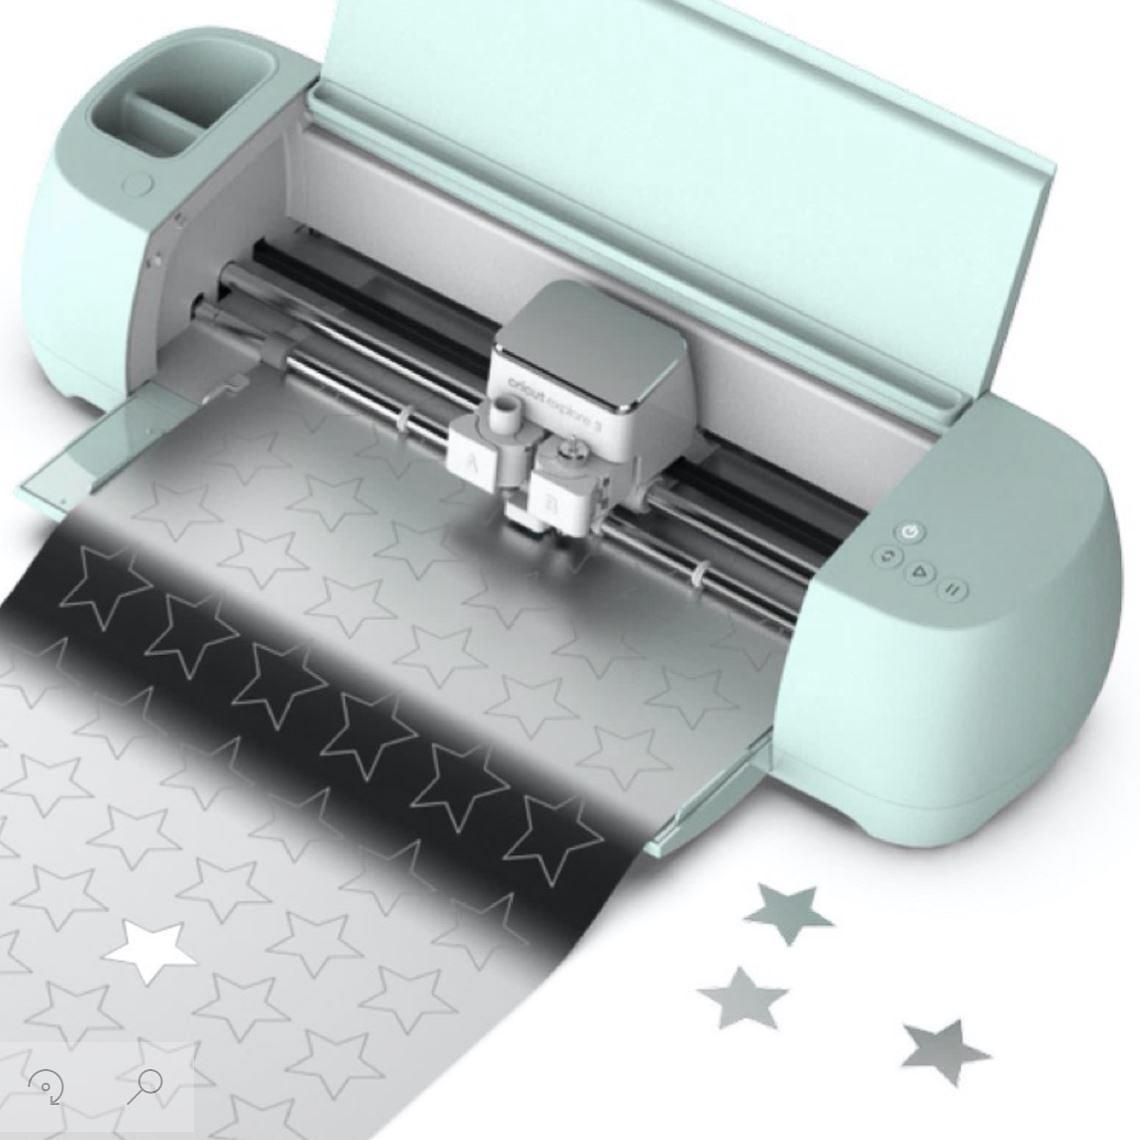 cricut explore 3 cutting with no mat